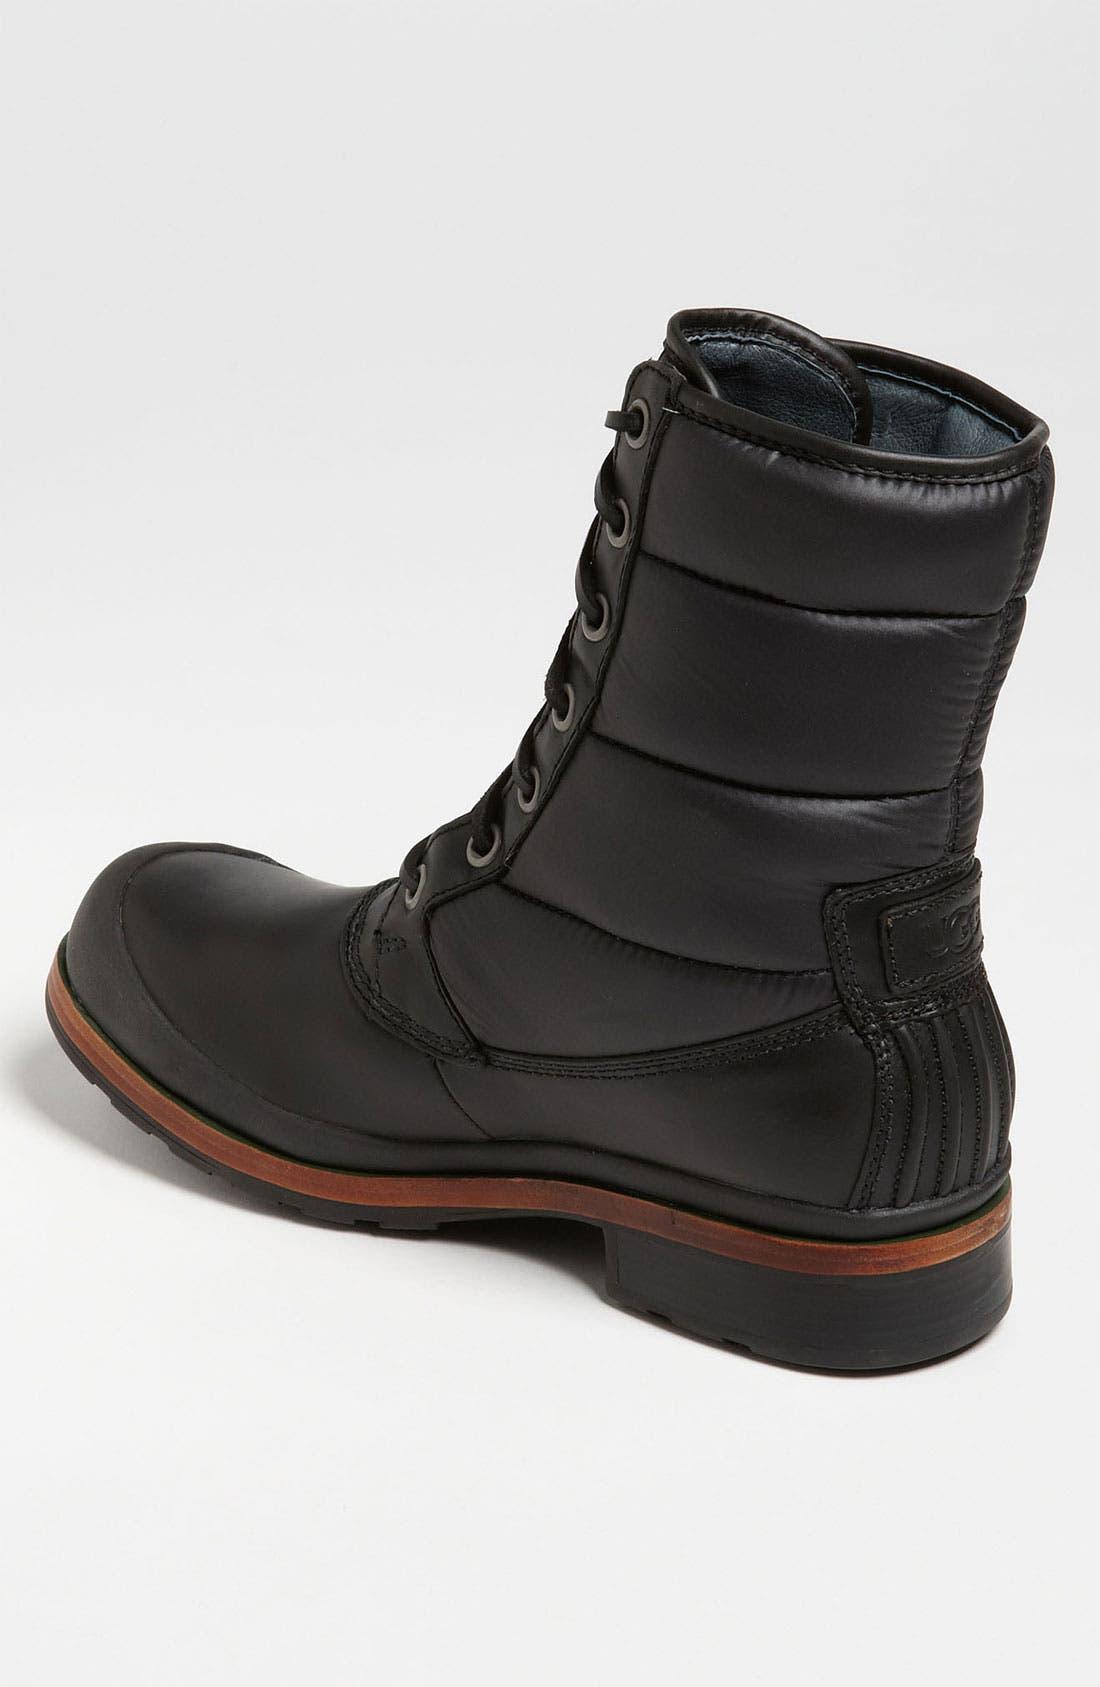 Alternate Image 2  - UGG® Australia 'Hamric' Quilted Snow Boot (Men) (Online Exclusive)